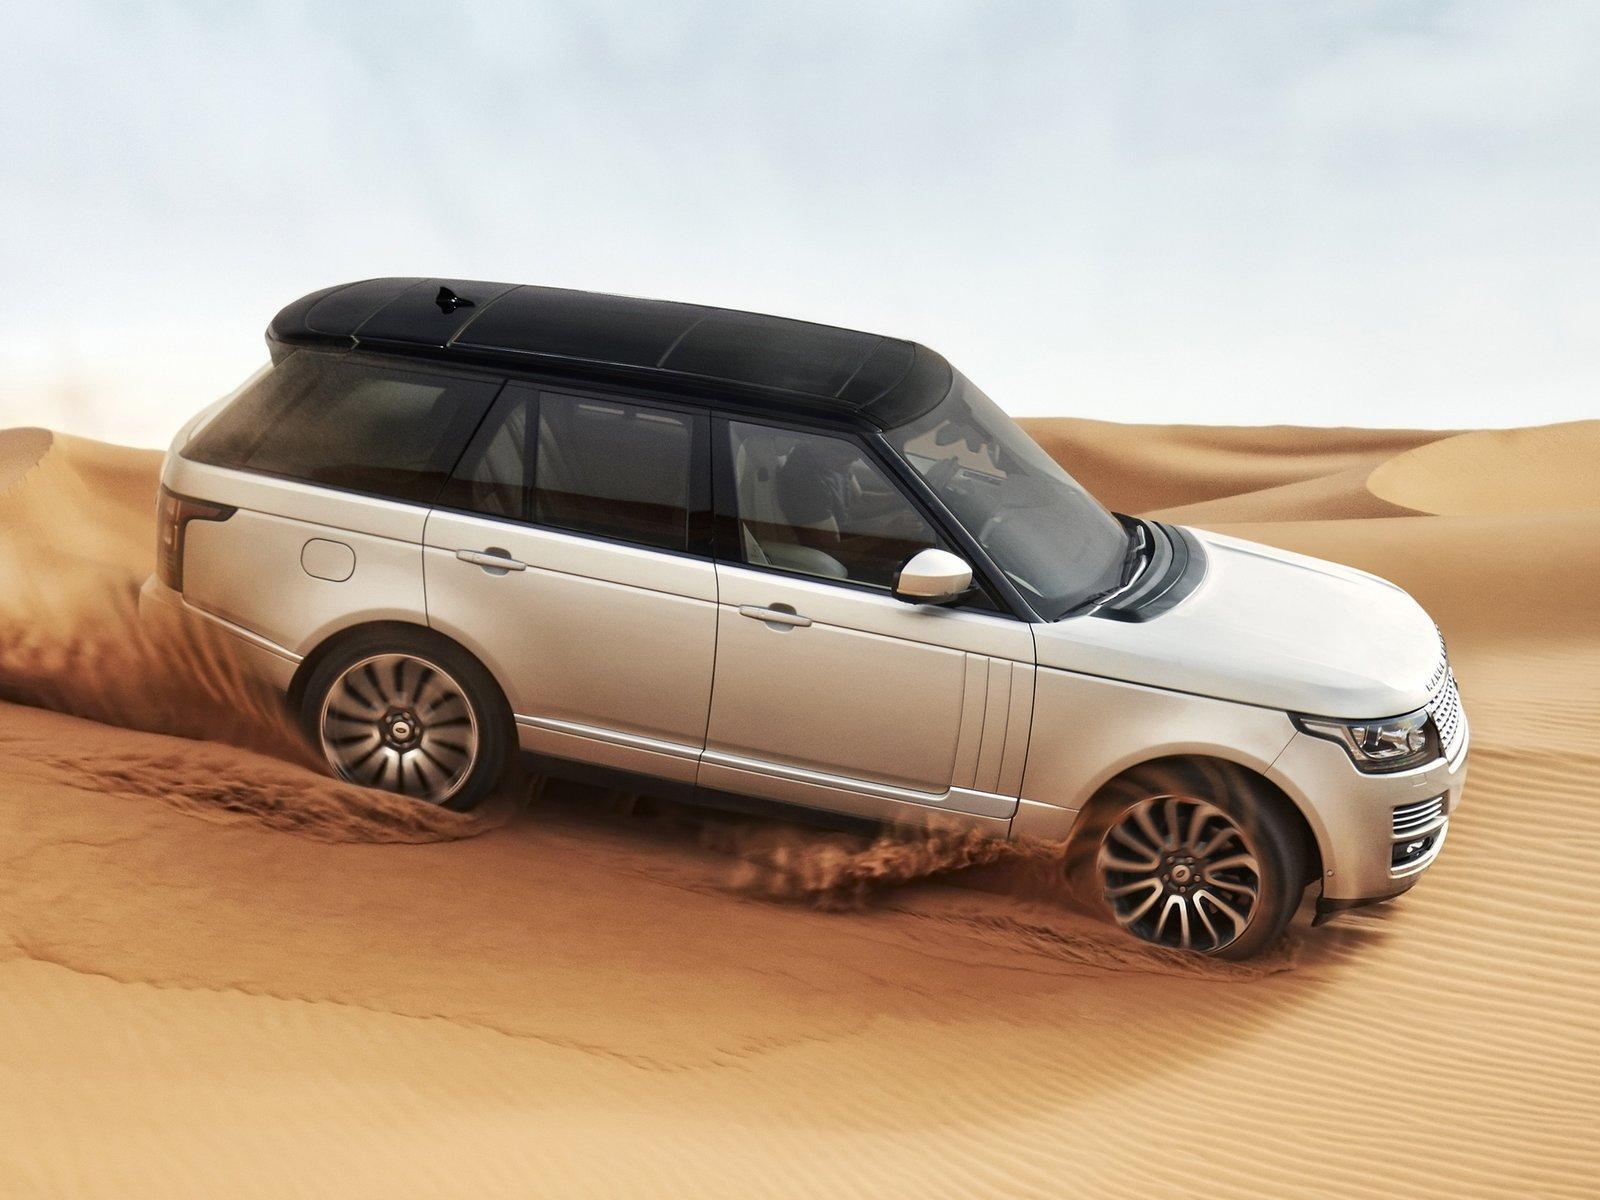 New 2013 Range Rover ficially Released [Video] autoevolution